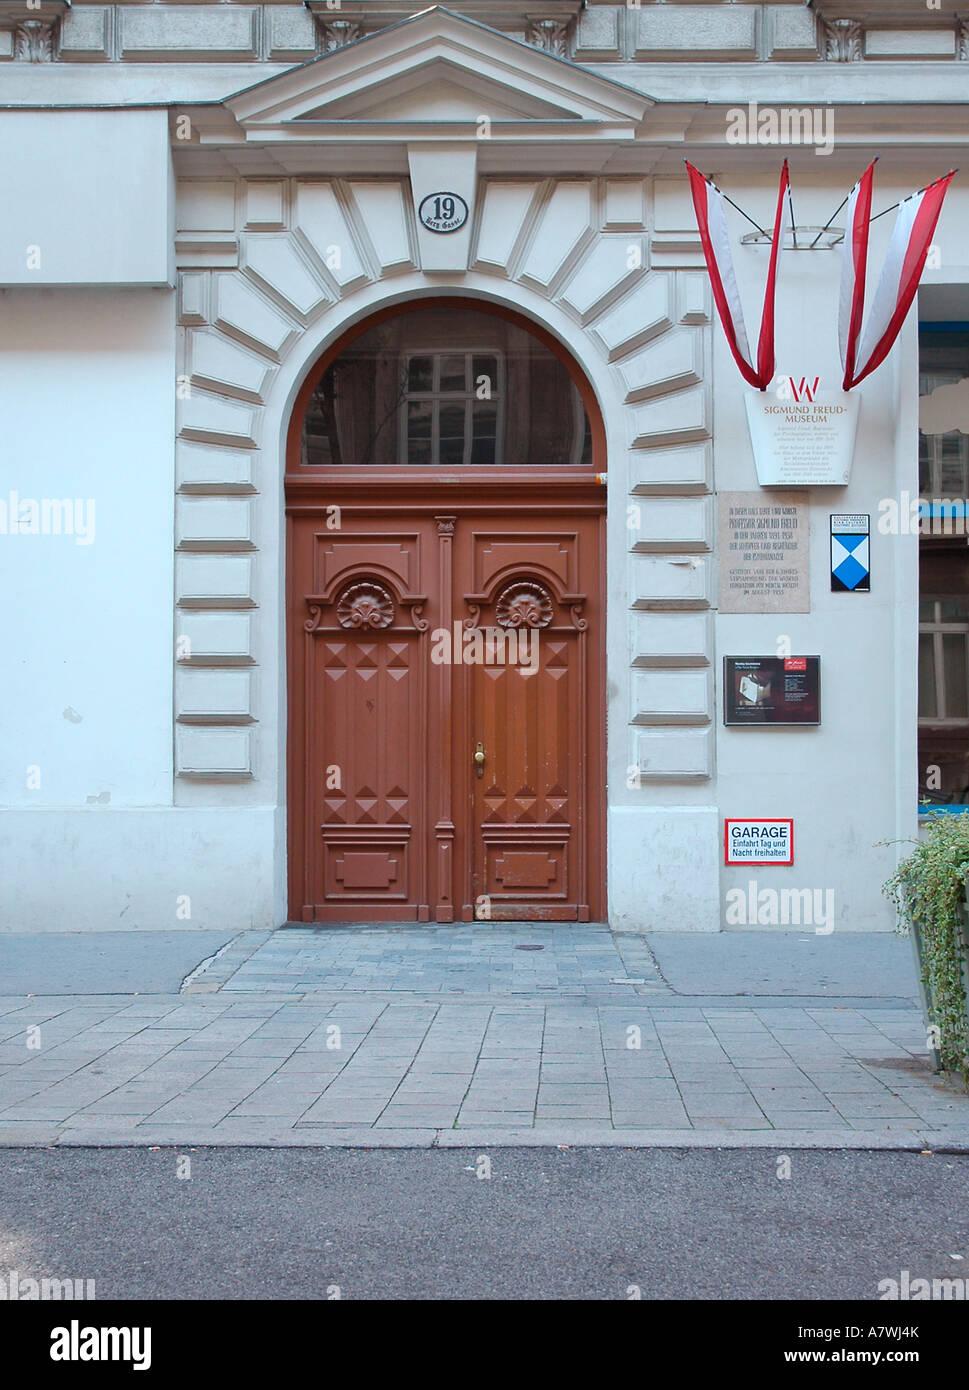 Former Domicile of Sigmund Freud, Berggasse 19, Vienna, Austria, Europe - Stock Image